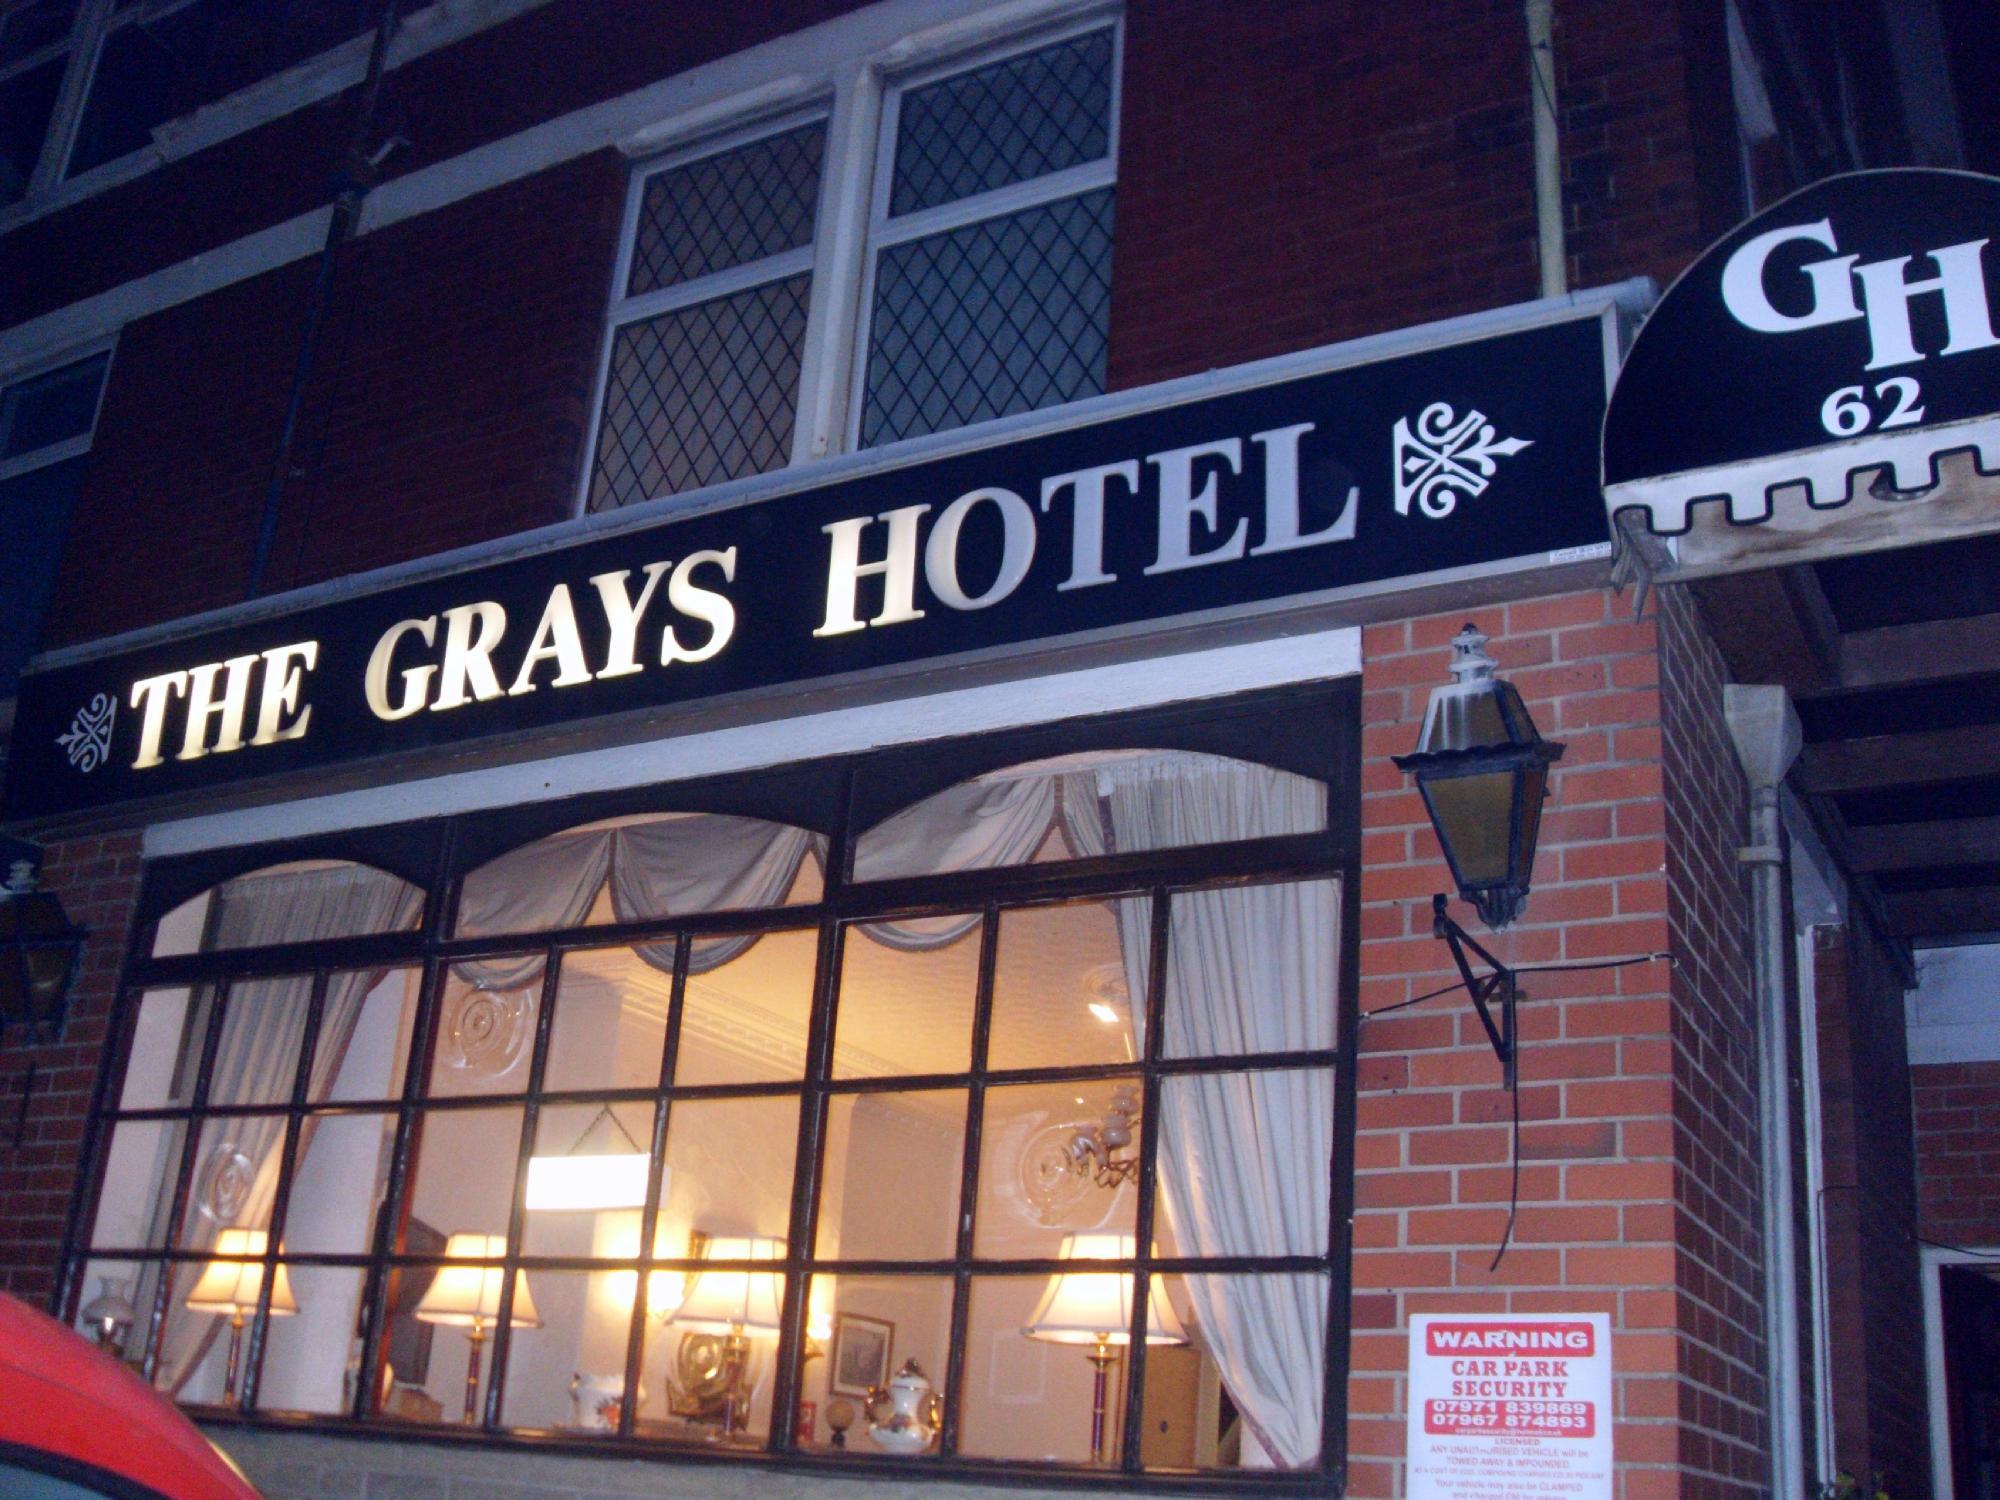 The Grays Hotel